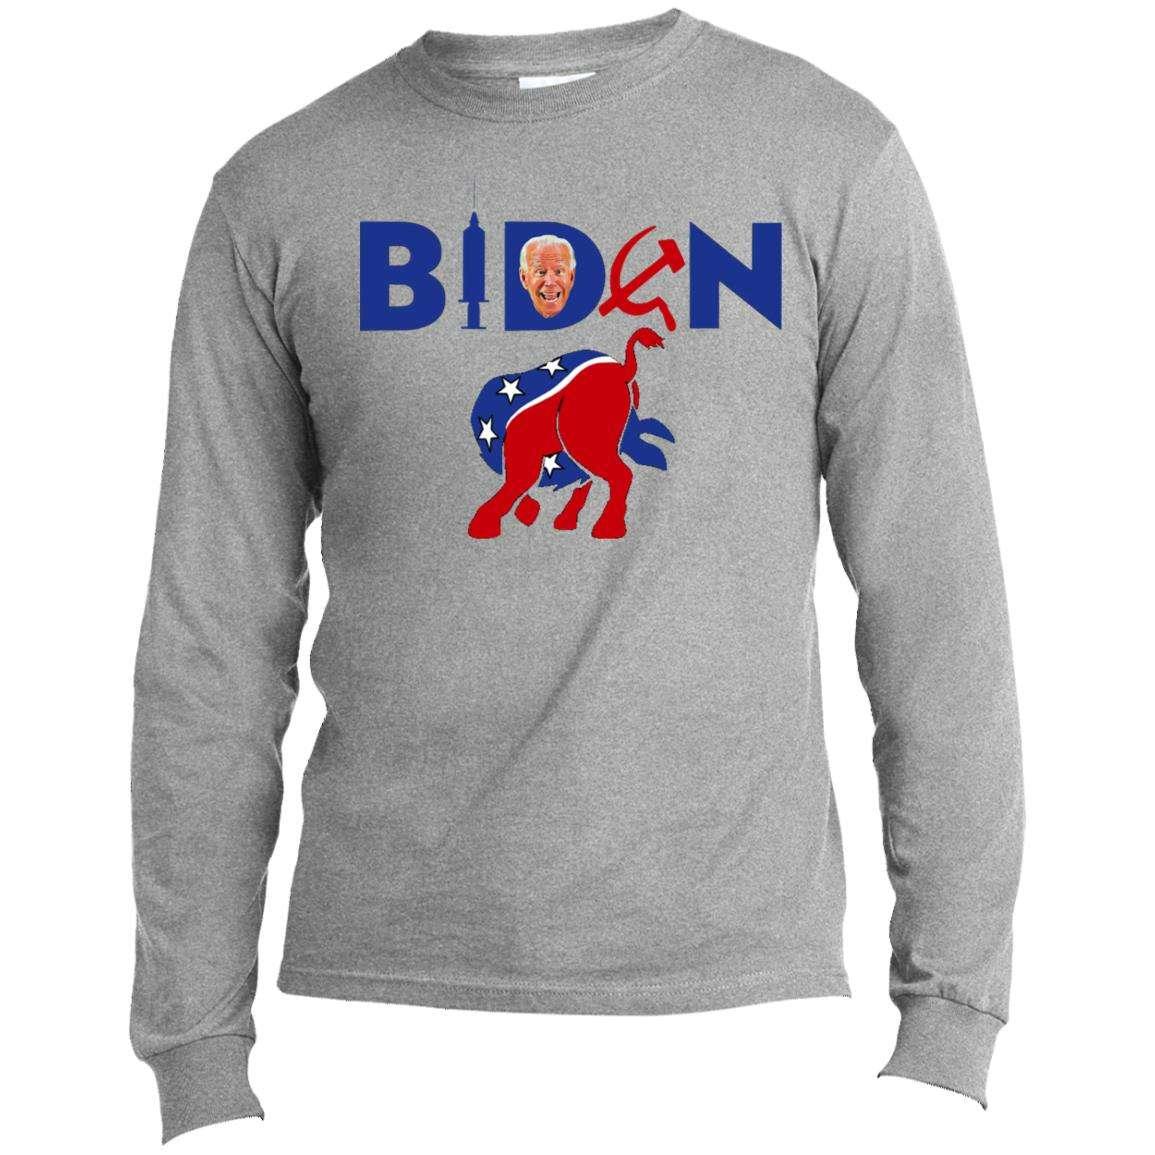 Biden Commie Vaccinator Jackass Long Sleeve T Shirt (4 Variants)